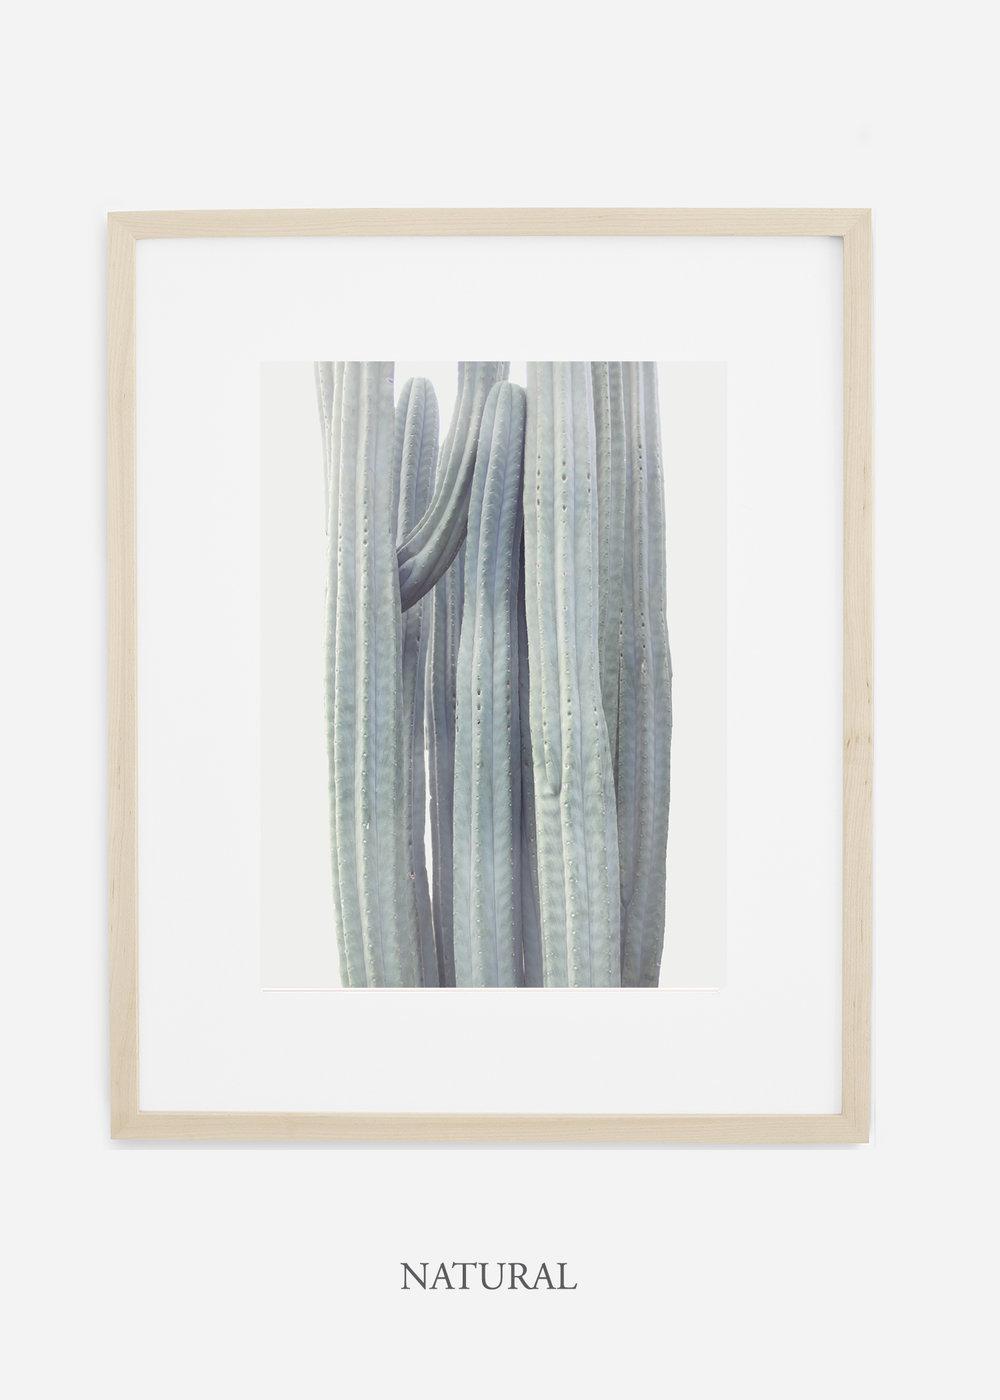 wildercalifornia_winterwhite_naturalframe_interiordesign_white_neutral_cactus_art_photography_large.jpg